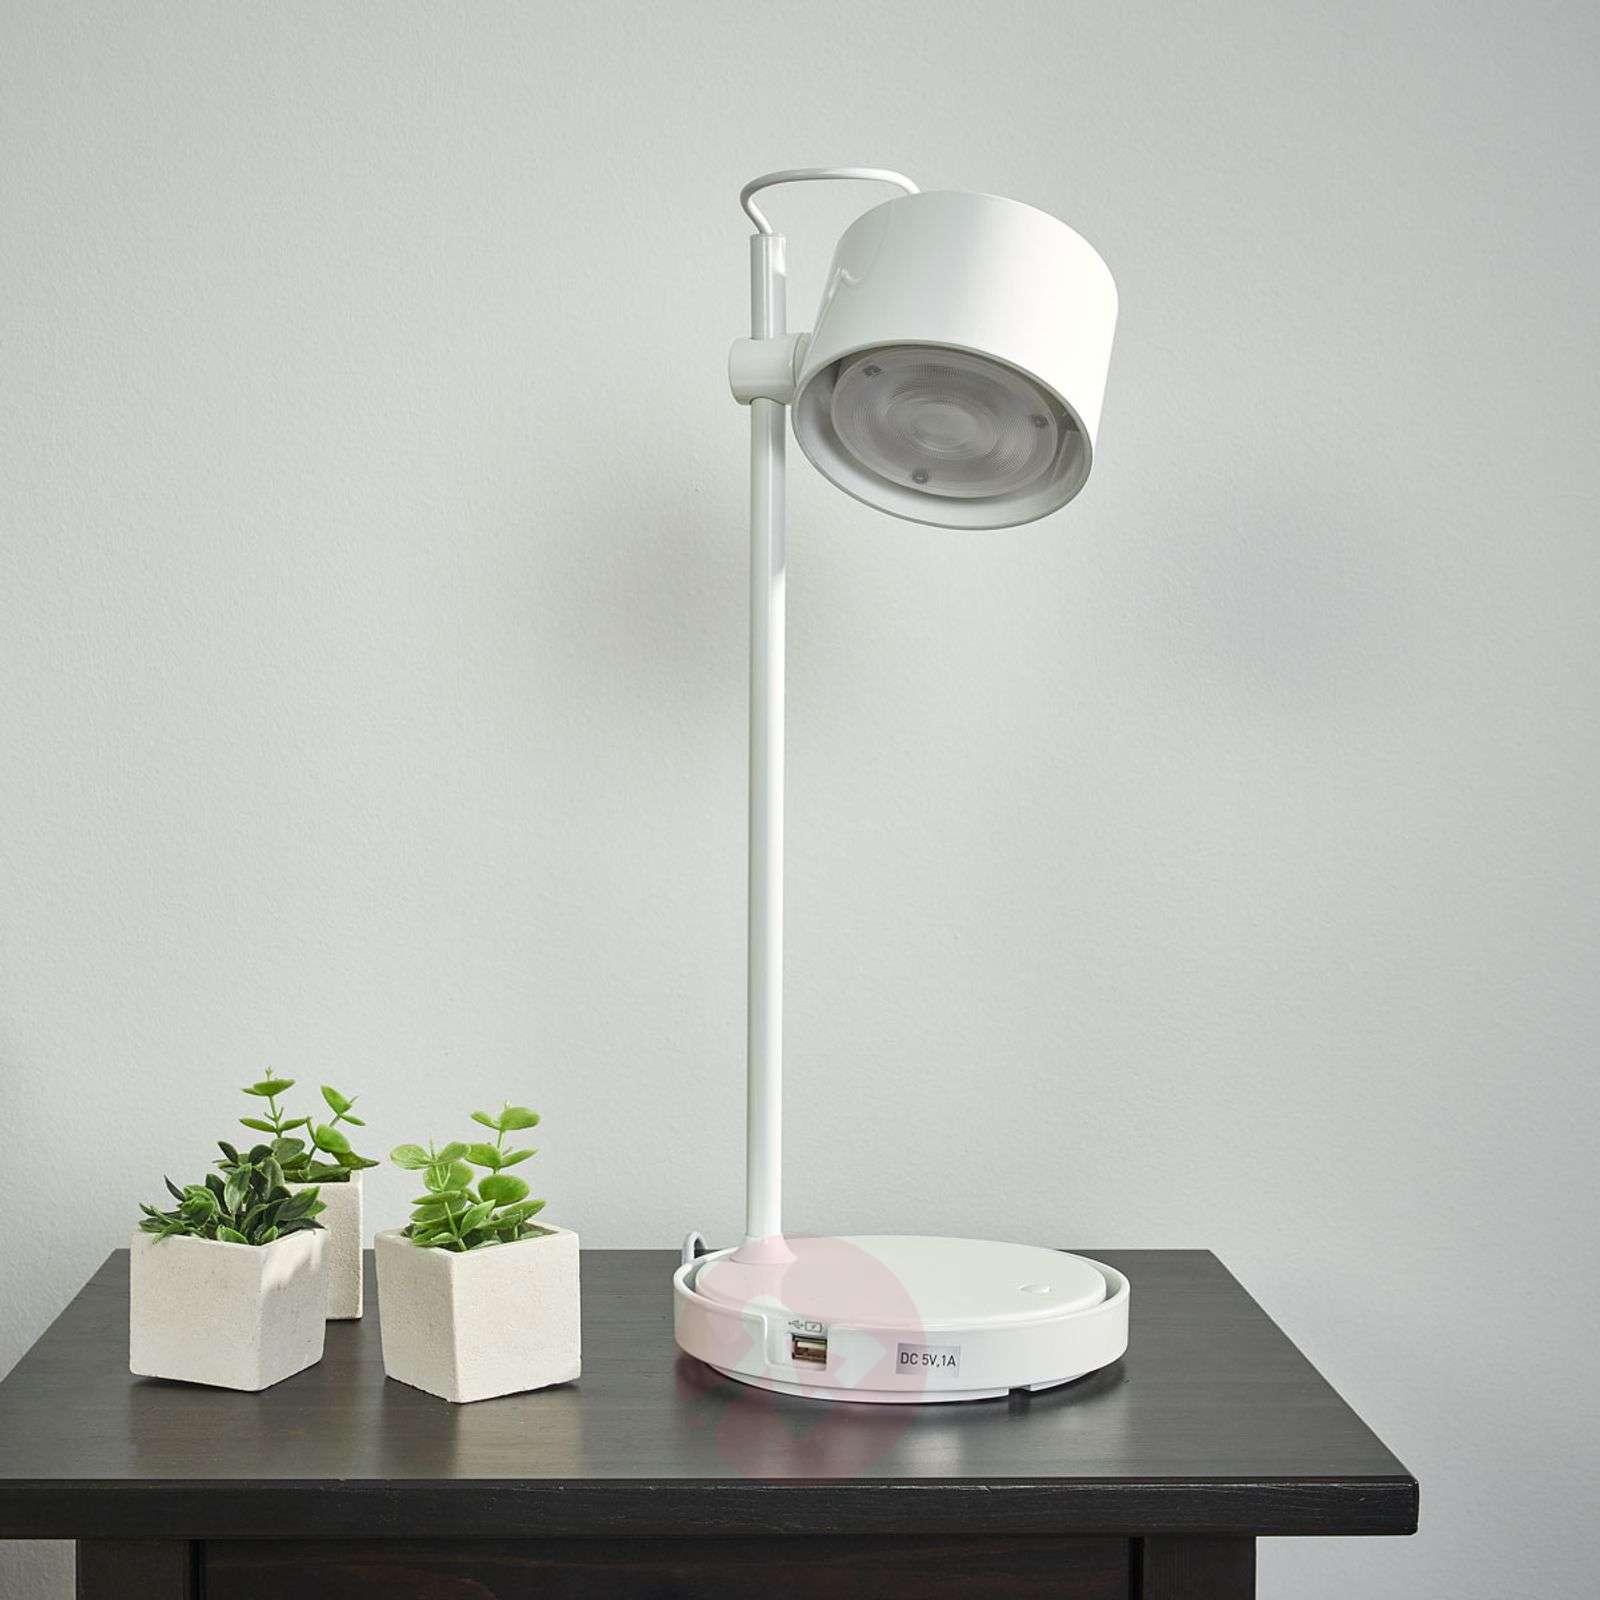 Glossy white LED iDual table lamp Jasmine-9038033-01